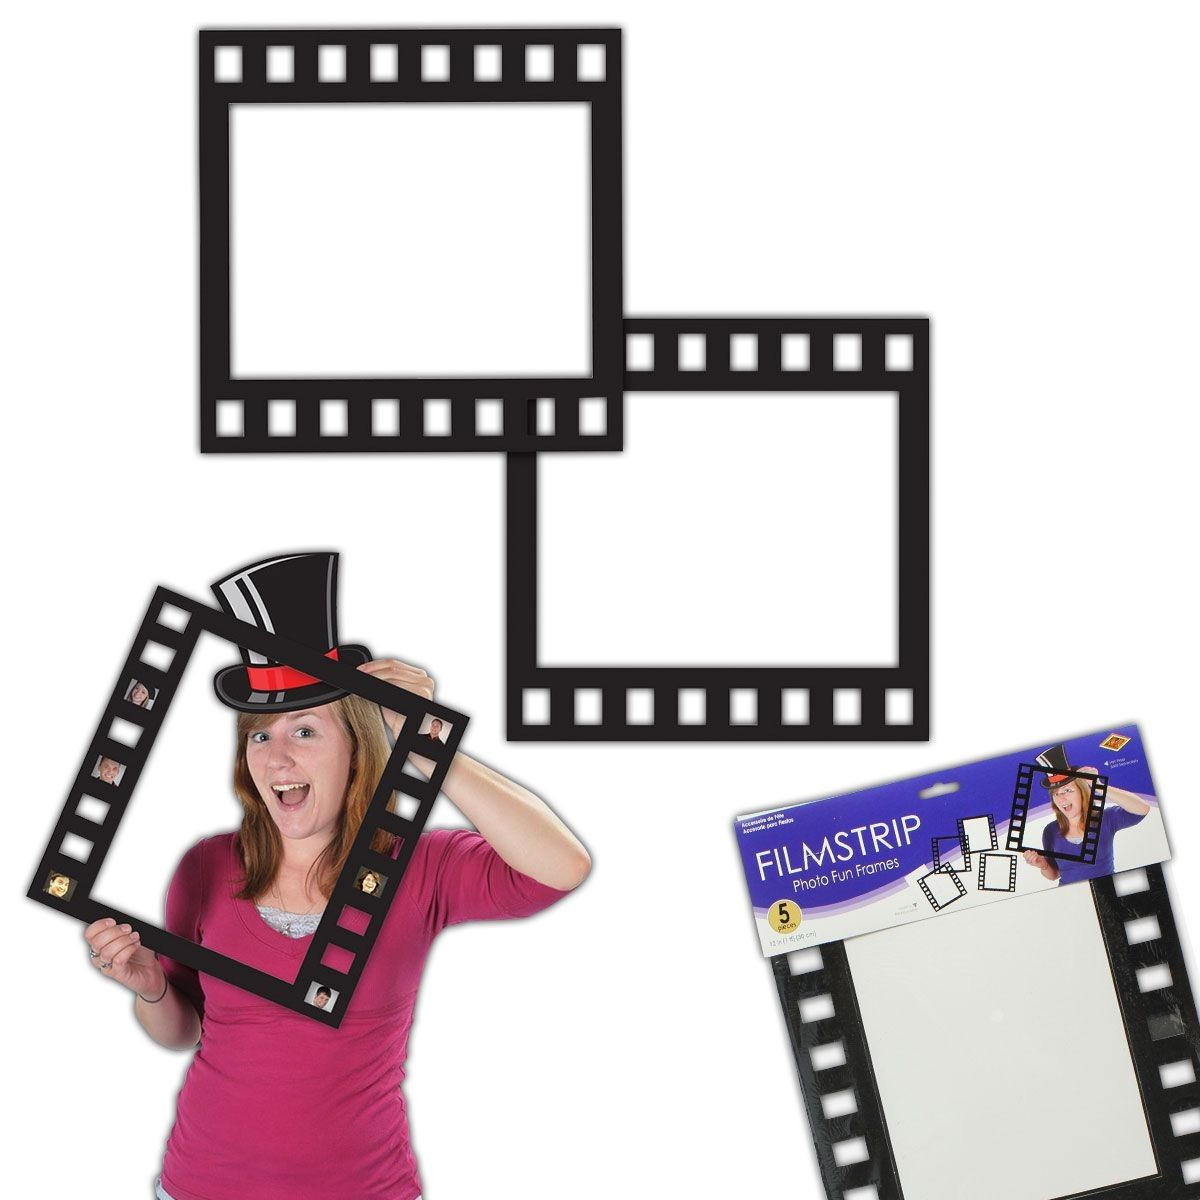 Film Strip Photo Frames - 5 Pack | Event Planning... | Pinterest ...